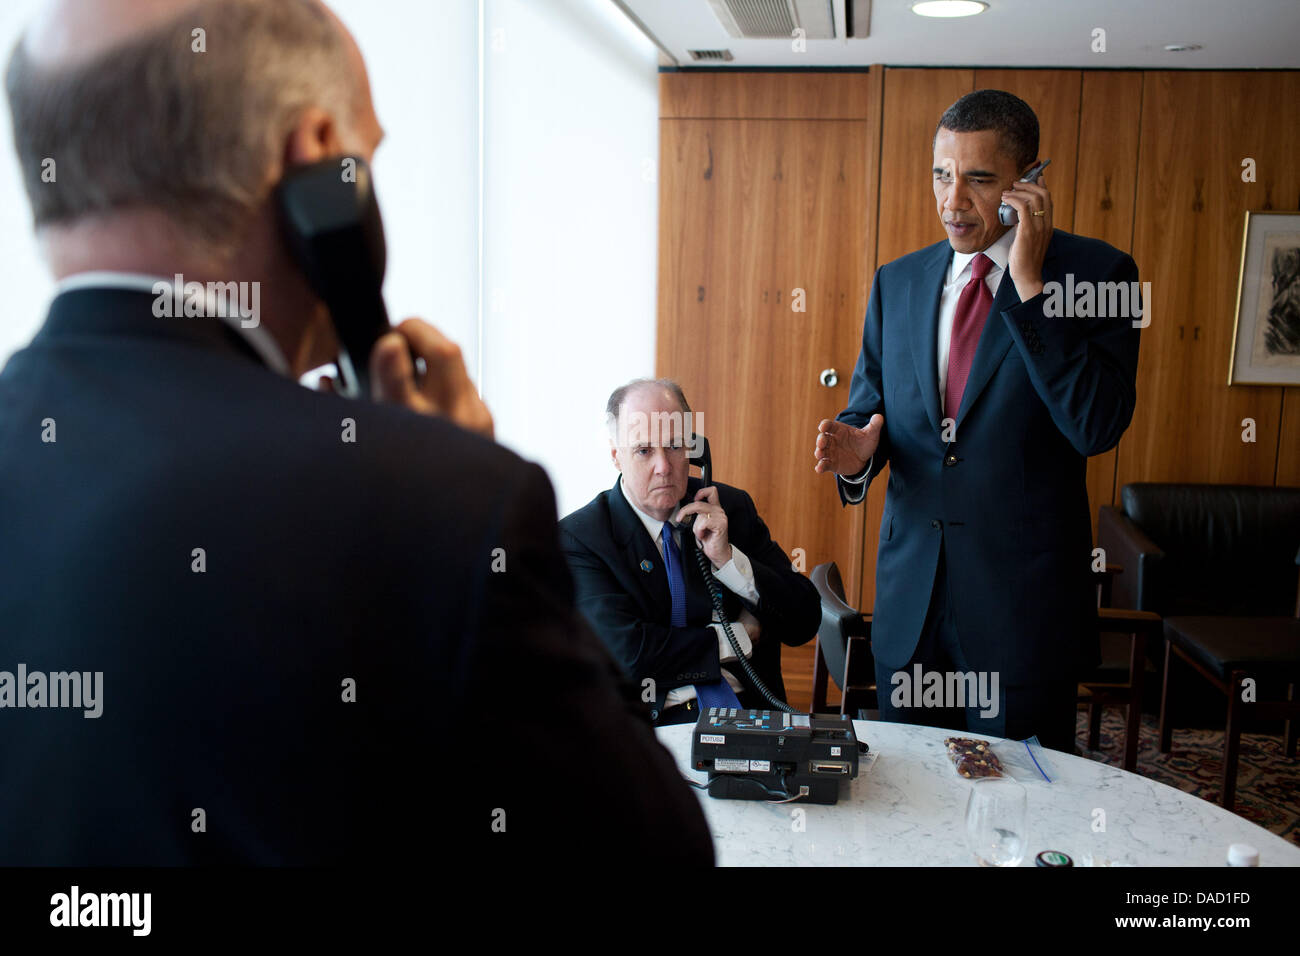 President Barack Obama phone call briefing on Libya at Palacio Do Planalto in Brasilia, Brazil, March 19, 2011. - Stock Image